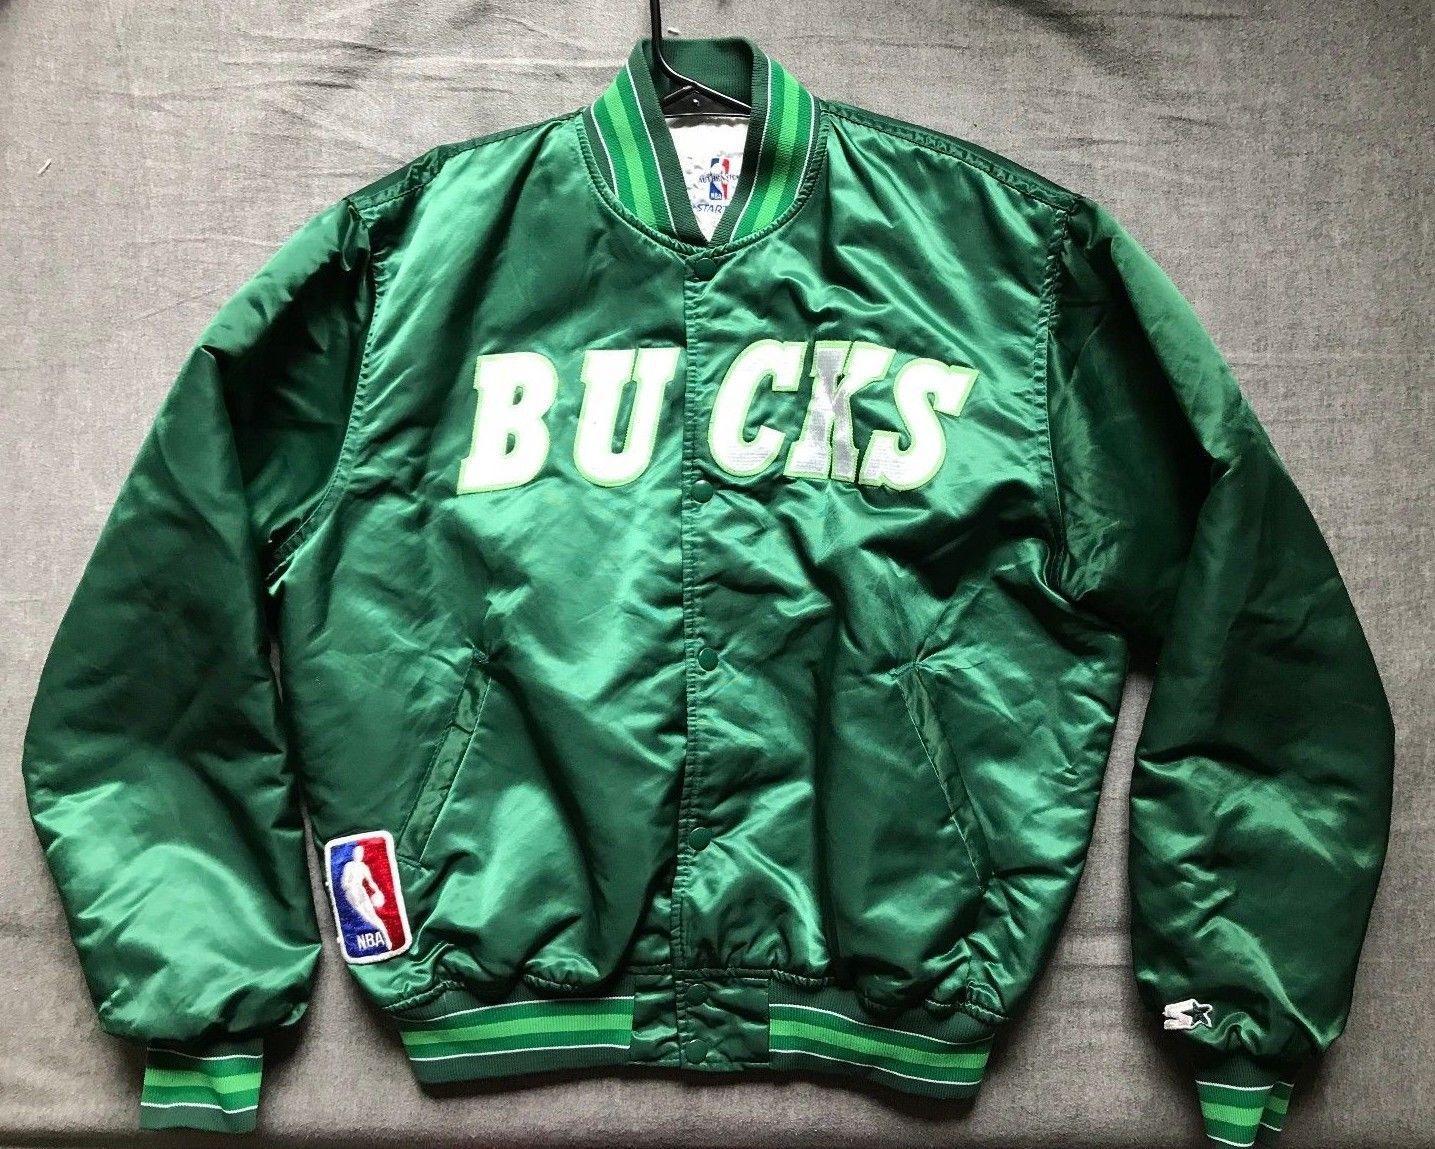 9c177dfc Men's vintage Starter NBA Milwaukee Bucks satin jacket size XL ...